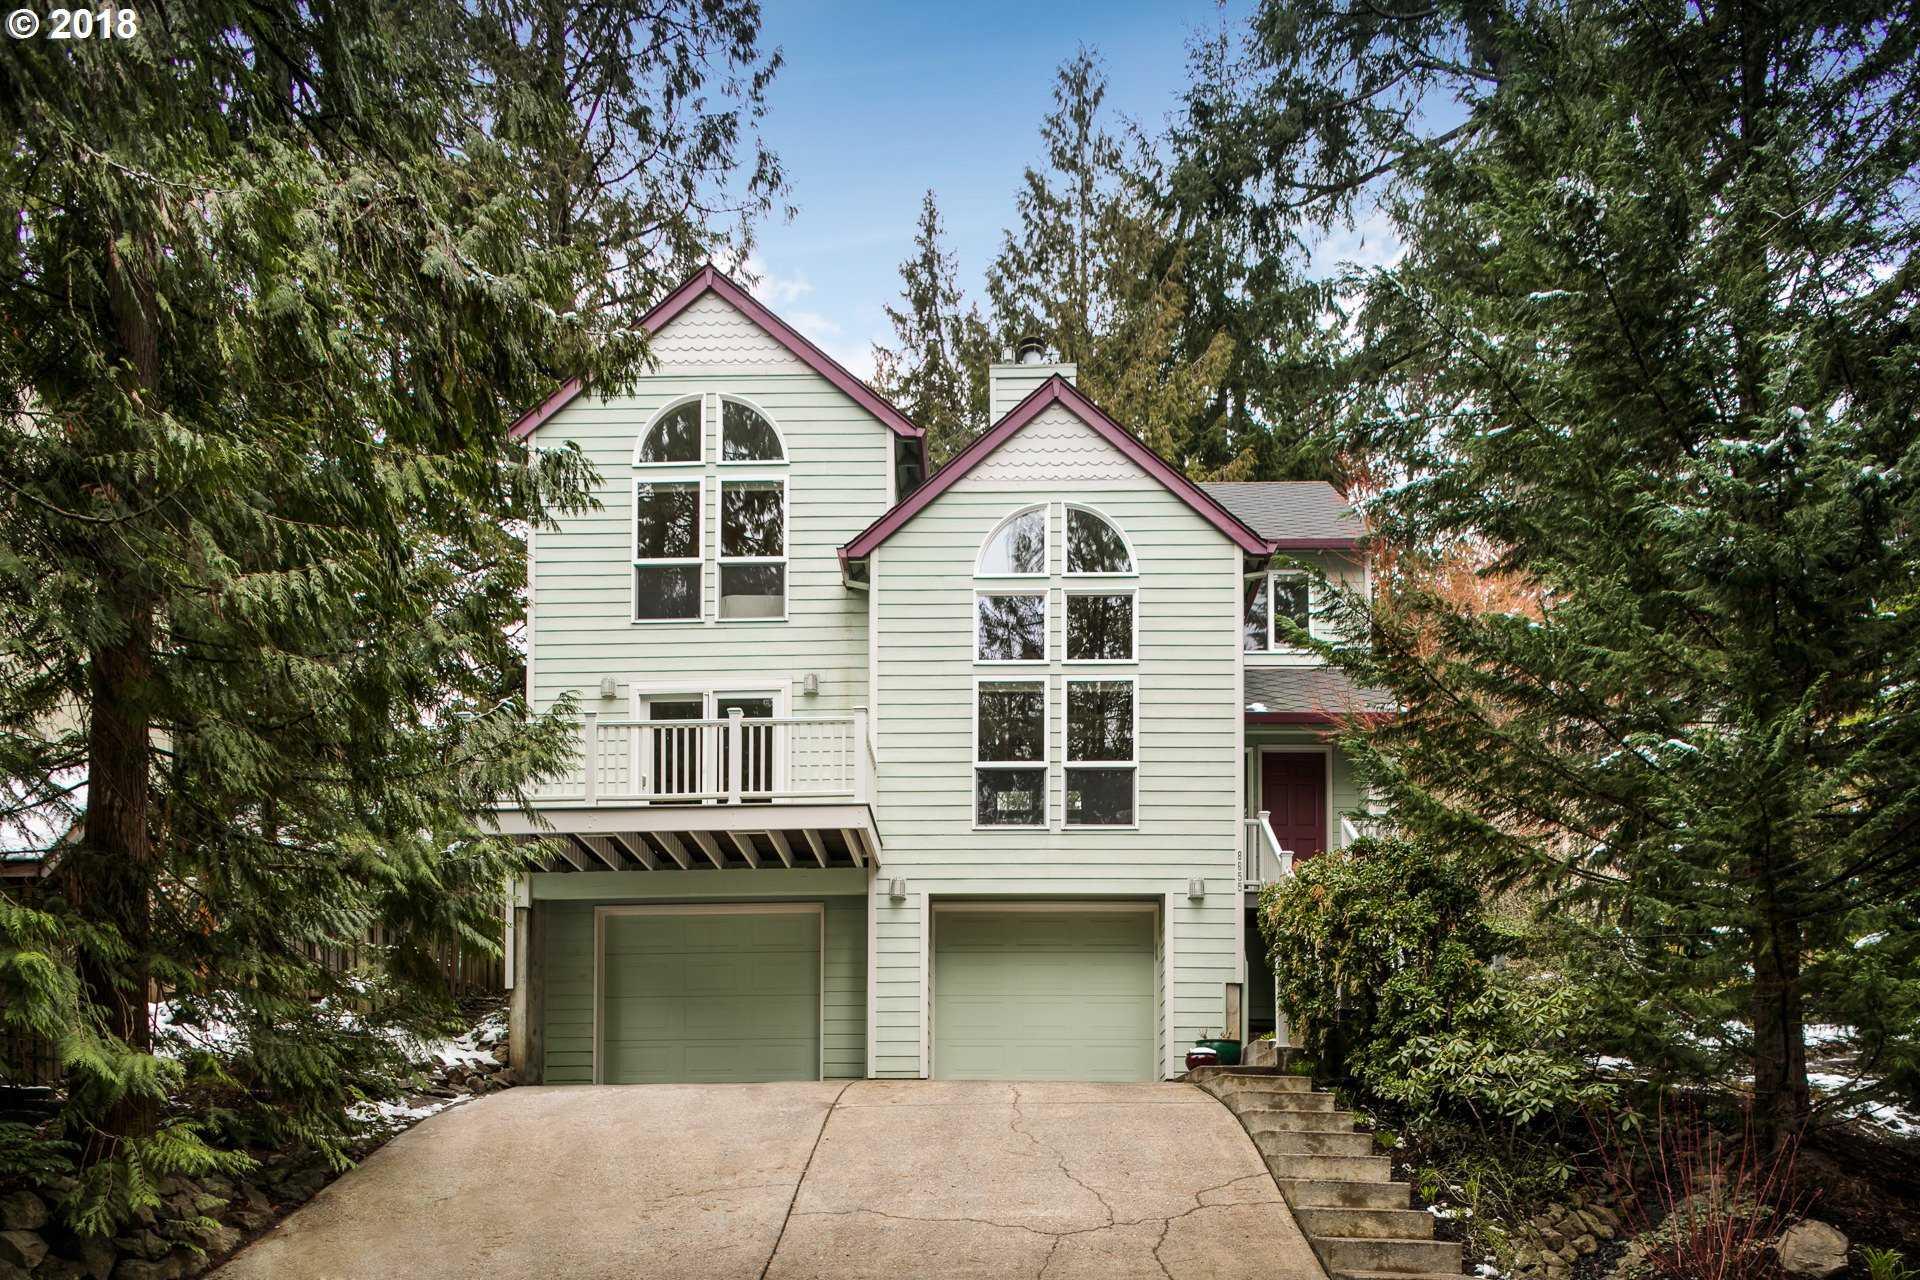 $500,000 - 3Br/3Ba -  for Sale in West Slope, Sylvan Heights, Portland